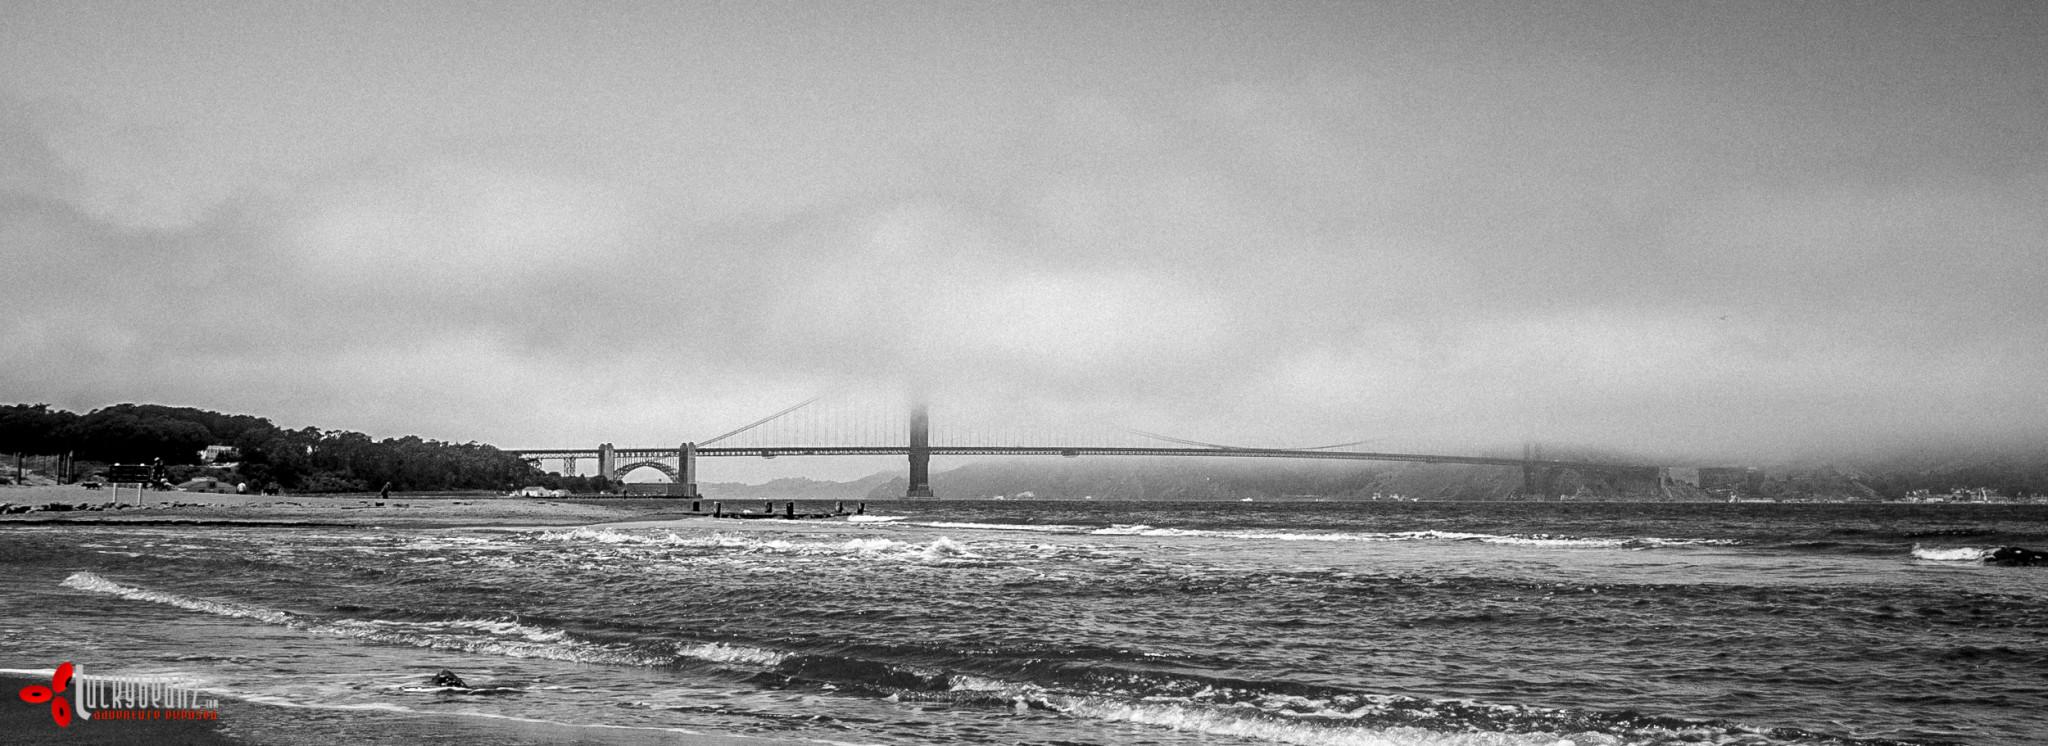 Next stop San Francisco.